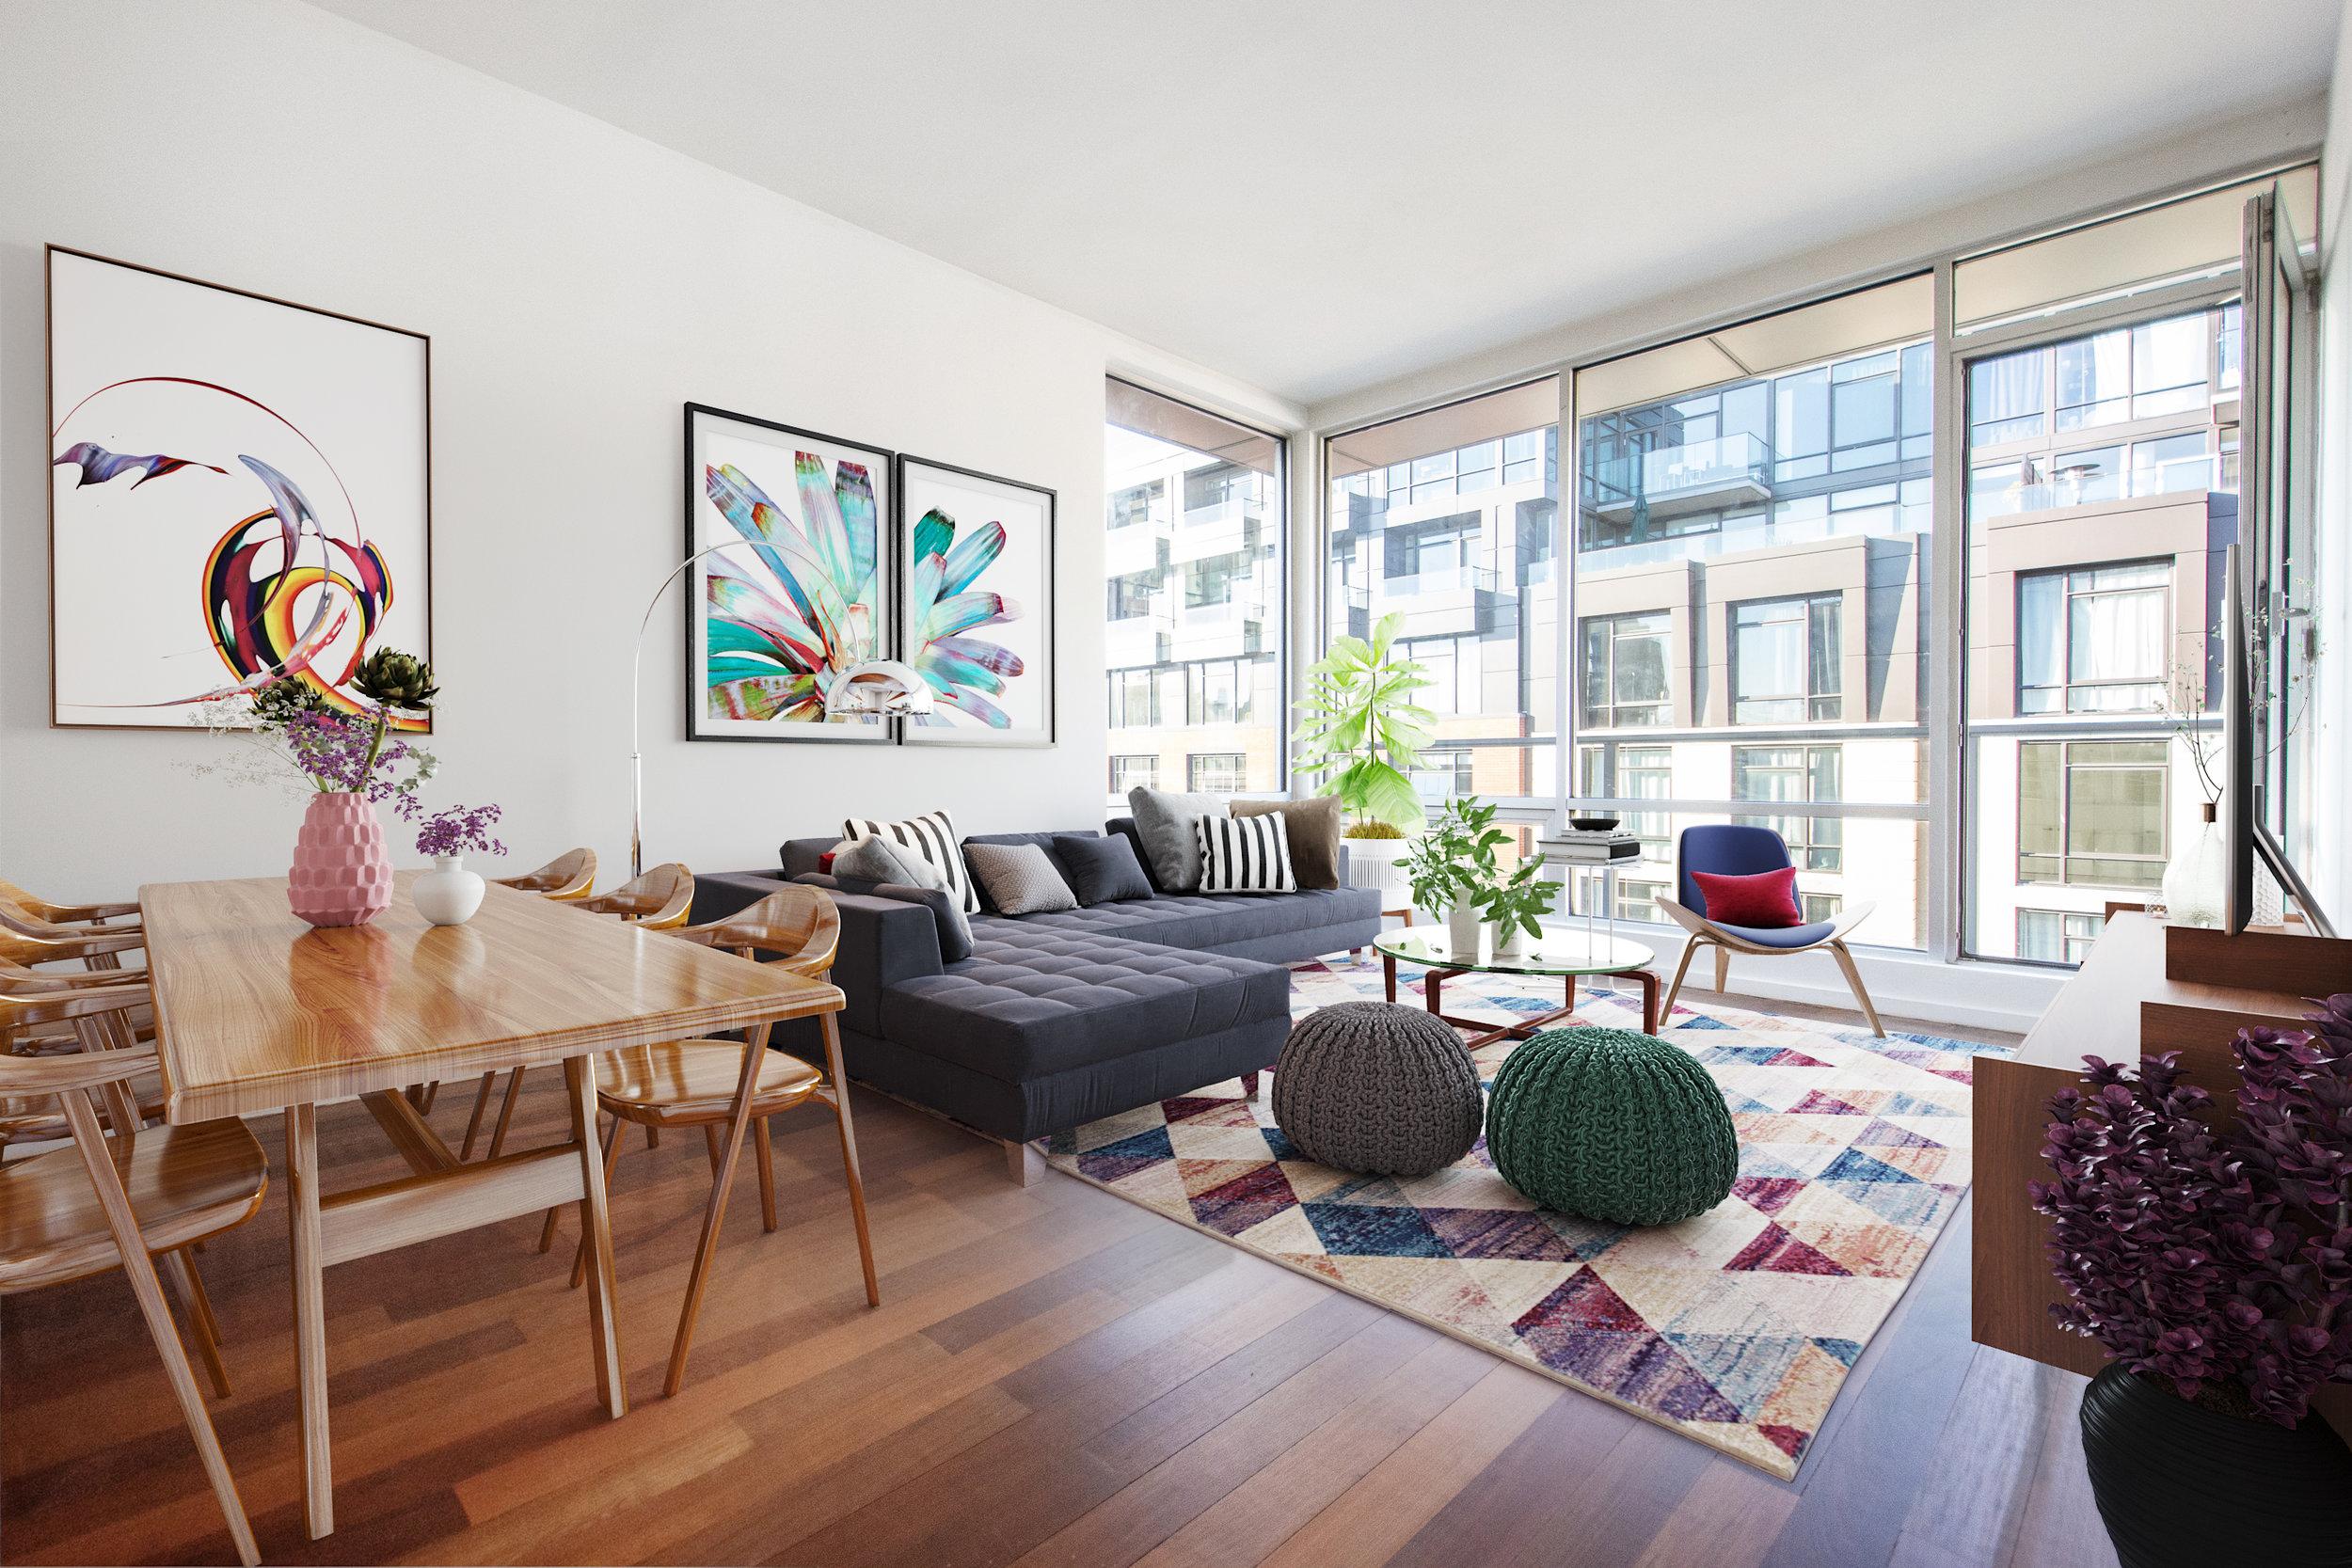 170 N11th St, 5D - Williamsburg | Brooklyn    1 Bedroom // 1 Bath Leased Price:    $3,500